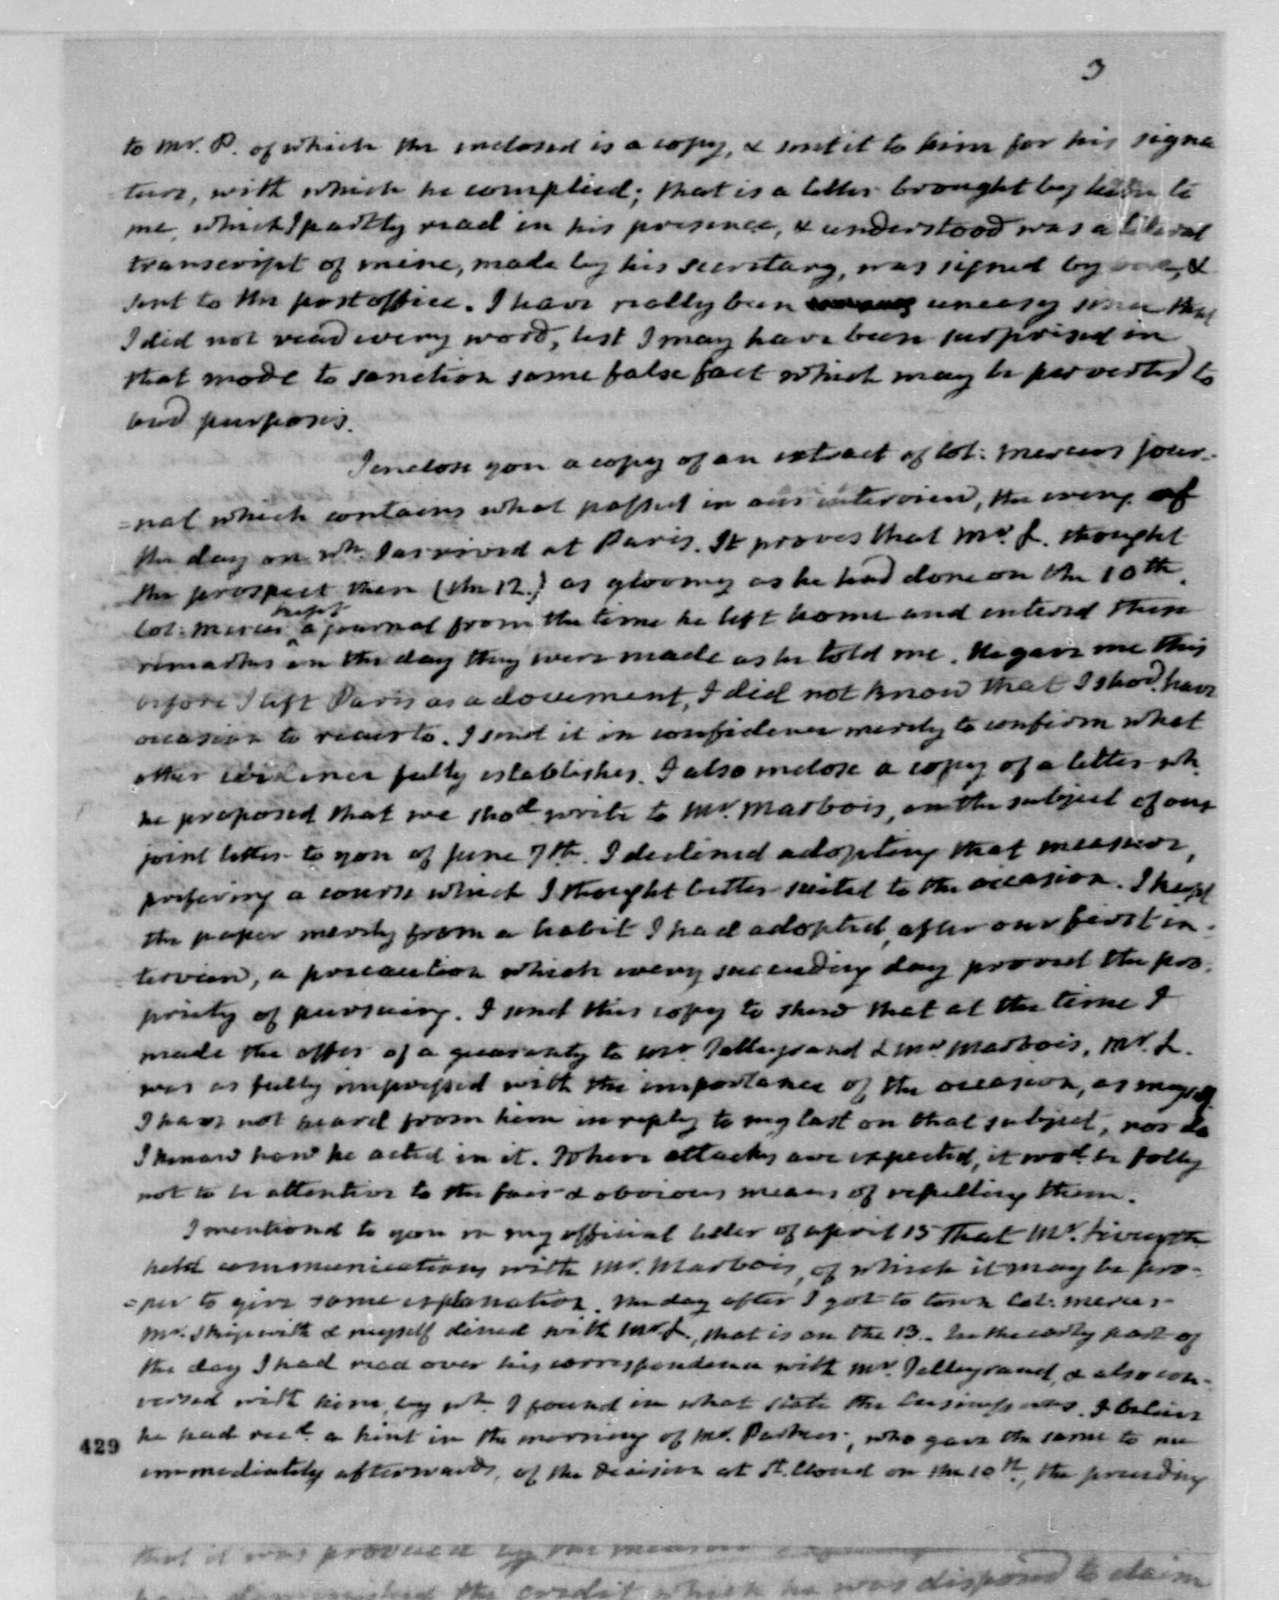 James Monroe to James Madison, September 17, 1803.